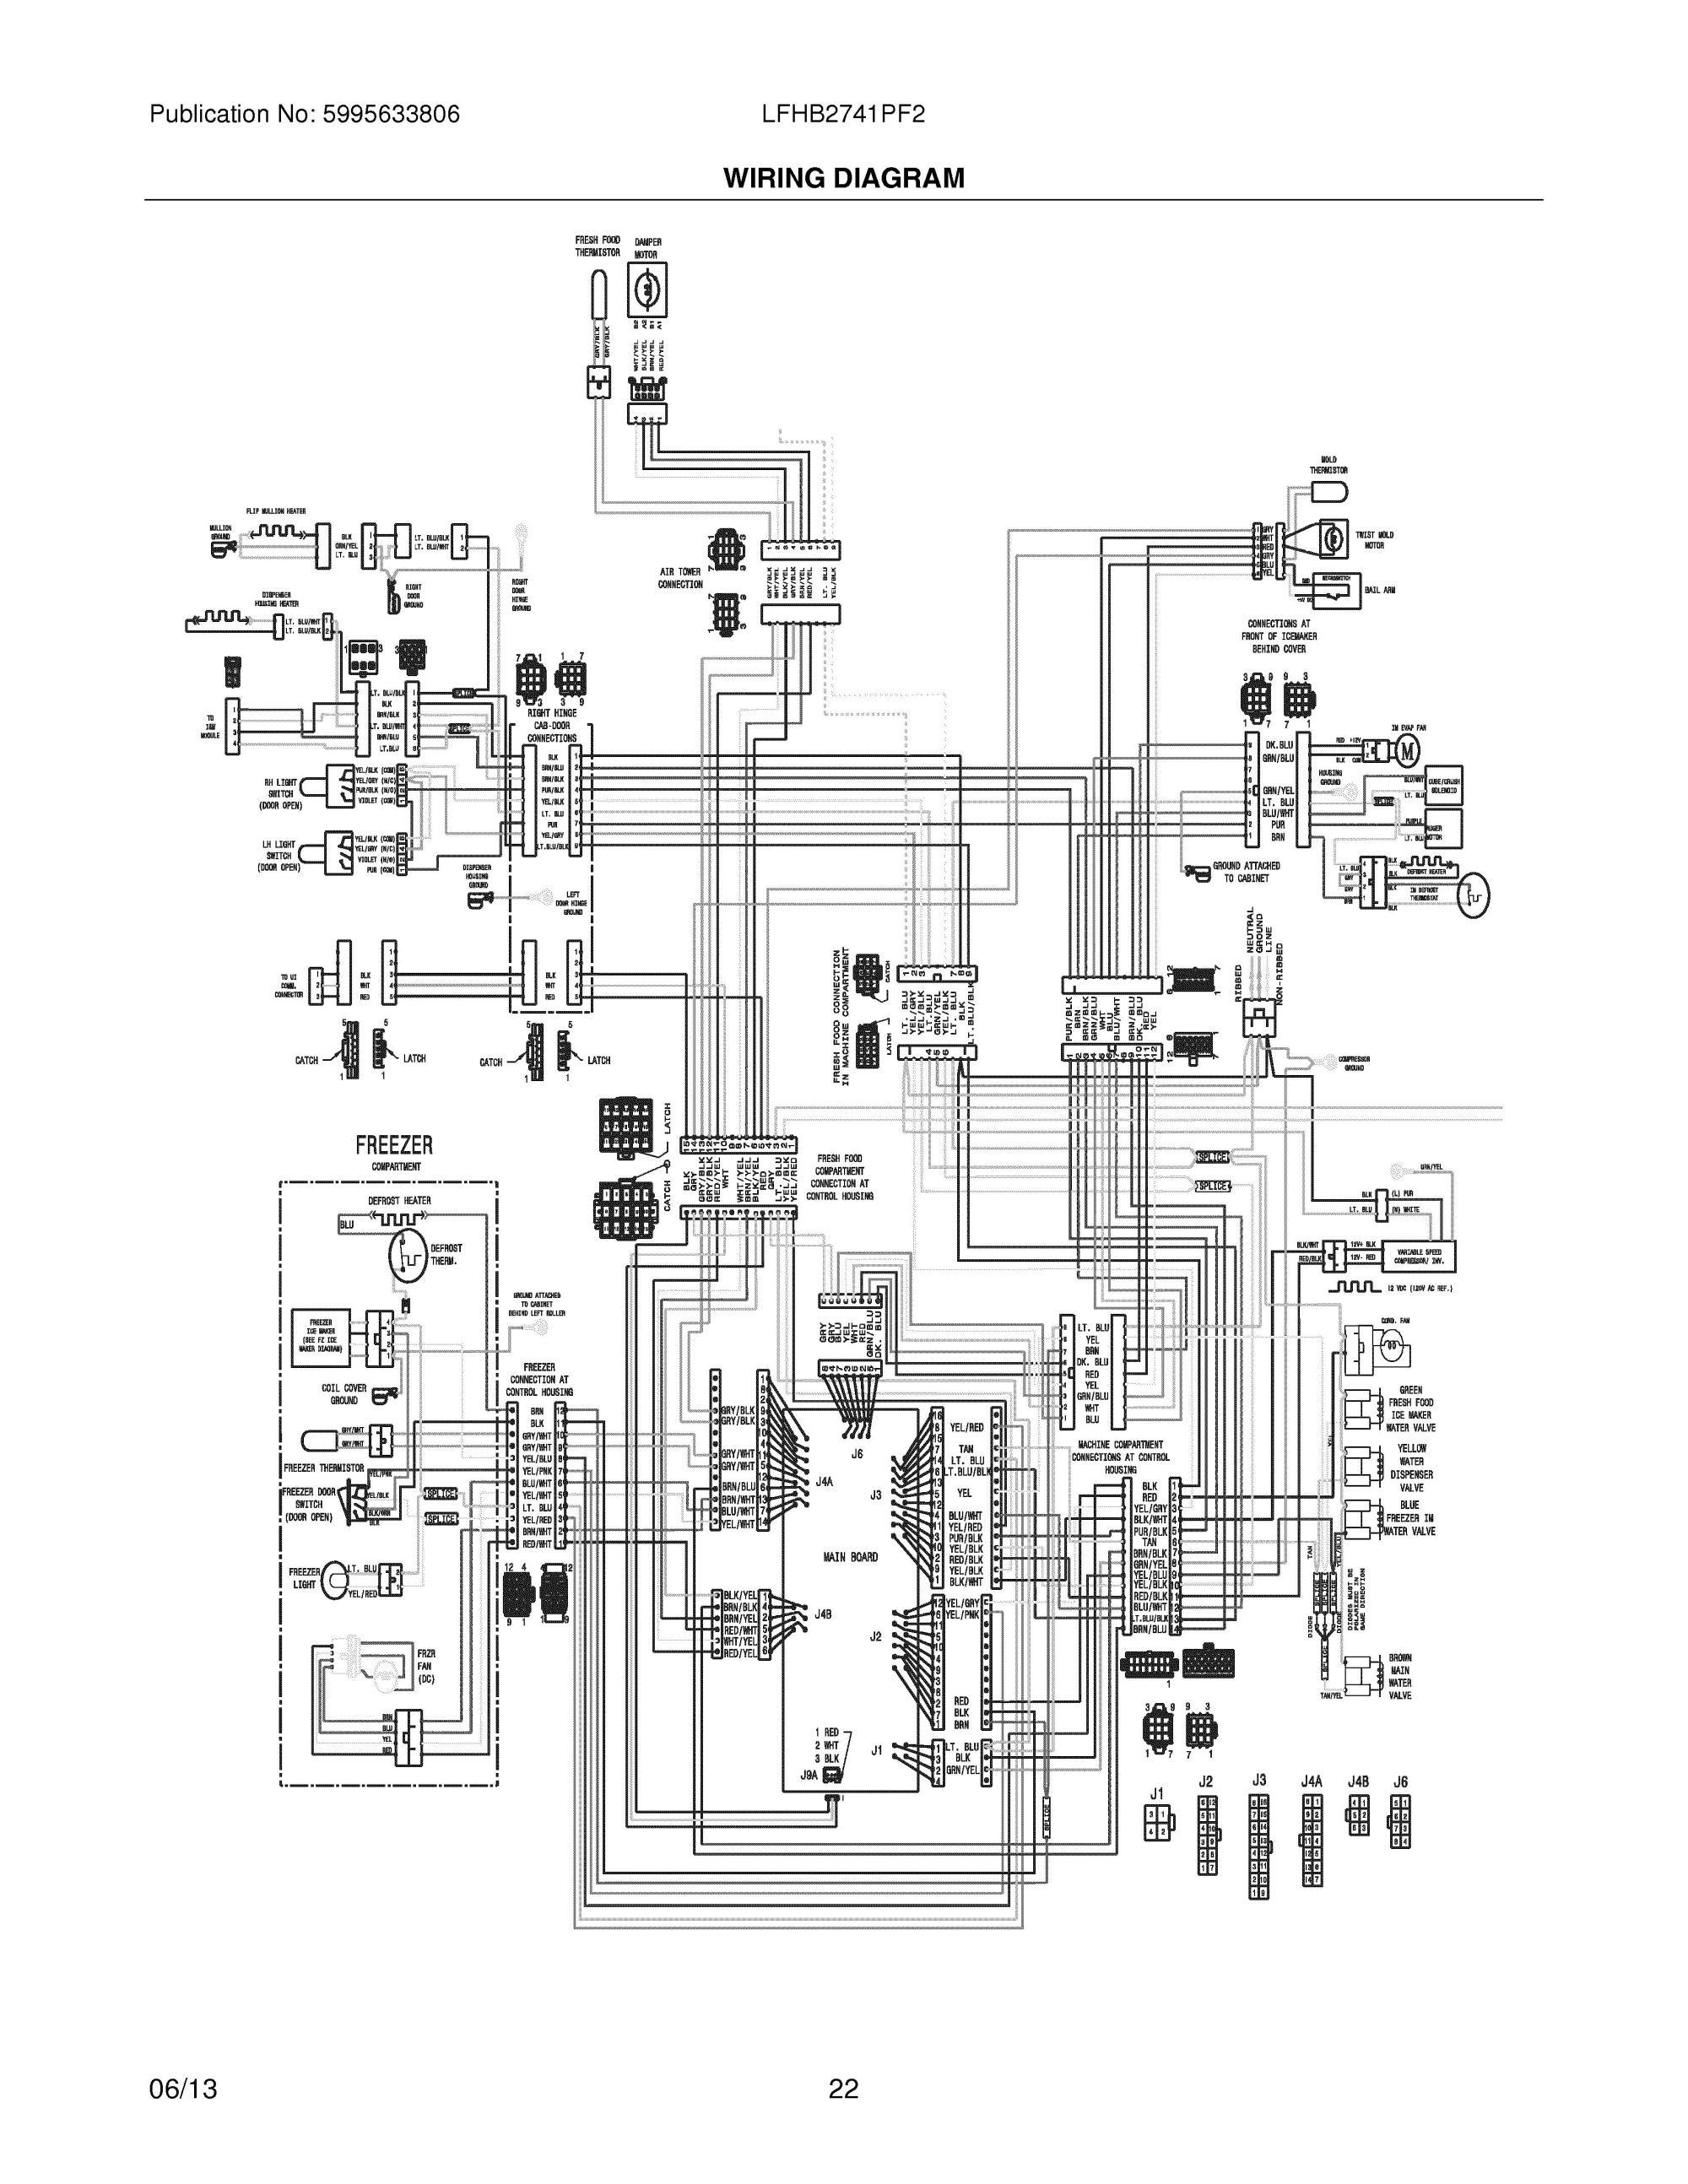 hight resolution of lowe 170w wiring diagram for schematic diagramlowe 170w wiring diagram for wiring diagram 2000 lowe 170w